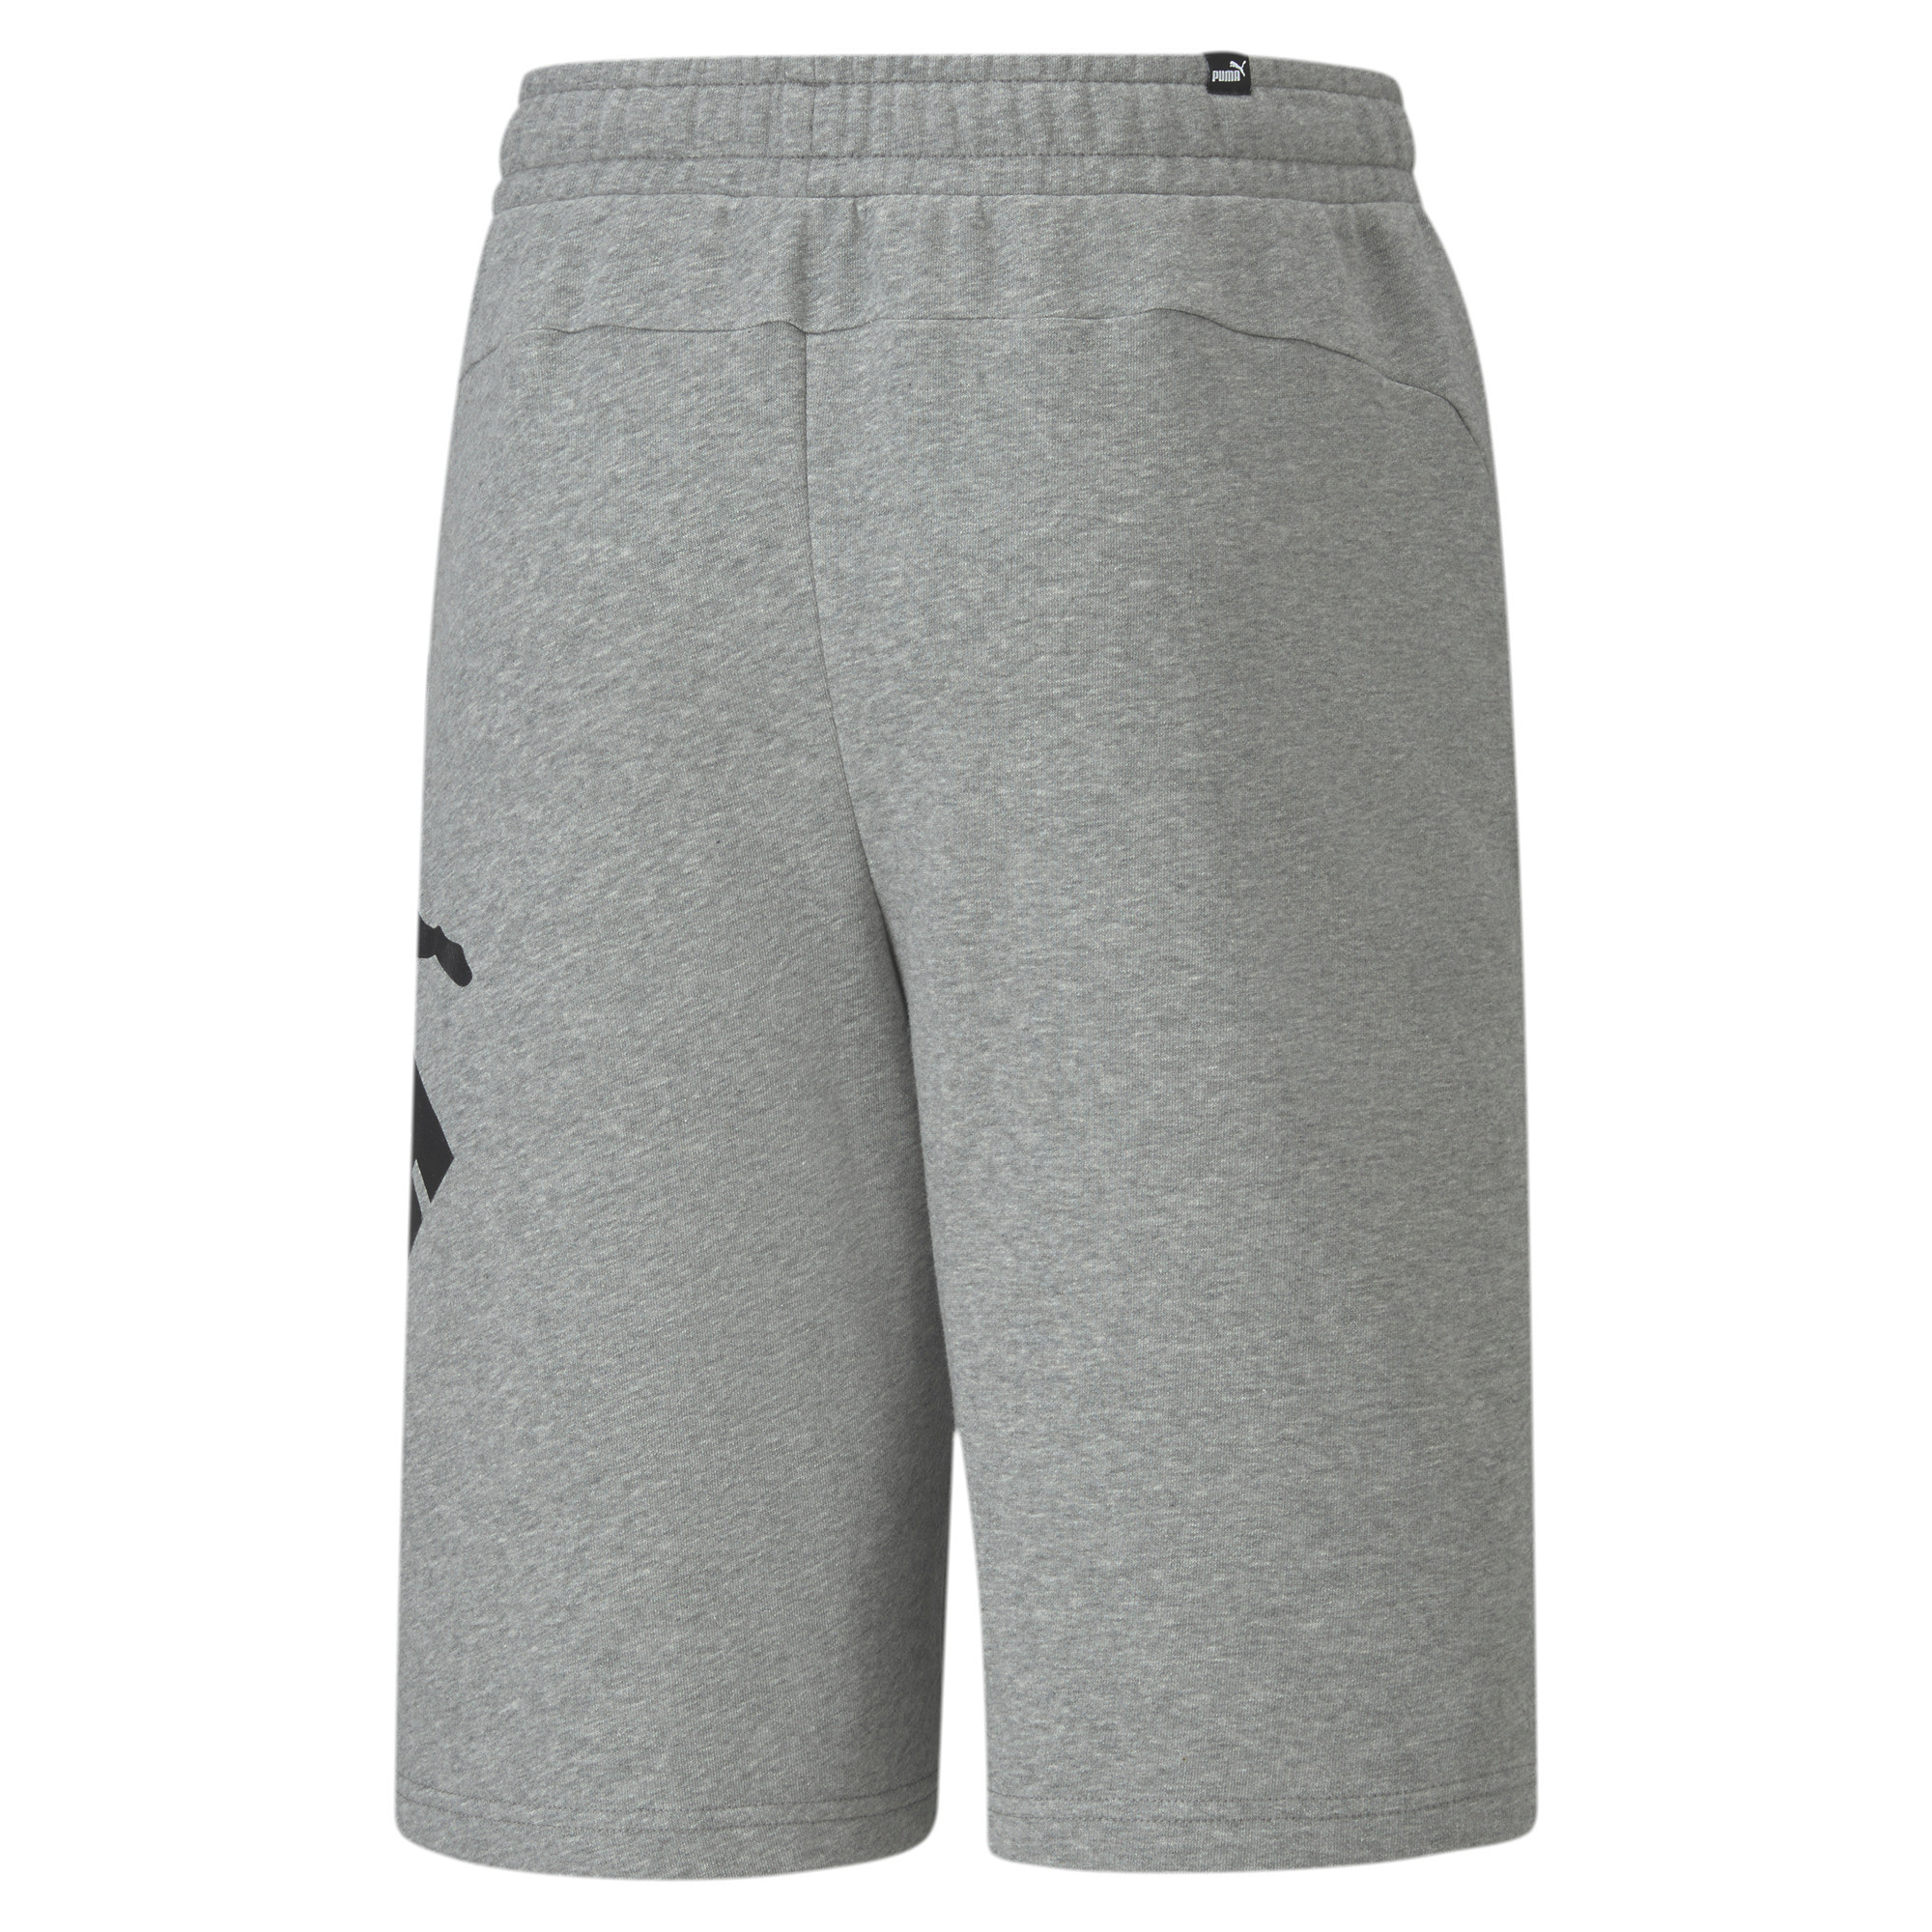 PUMA-Big-Logo-Men-039-s-Shorts-Men-Knitted-Shorts-Basics thumbnail 8